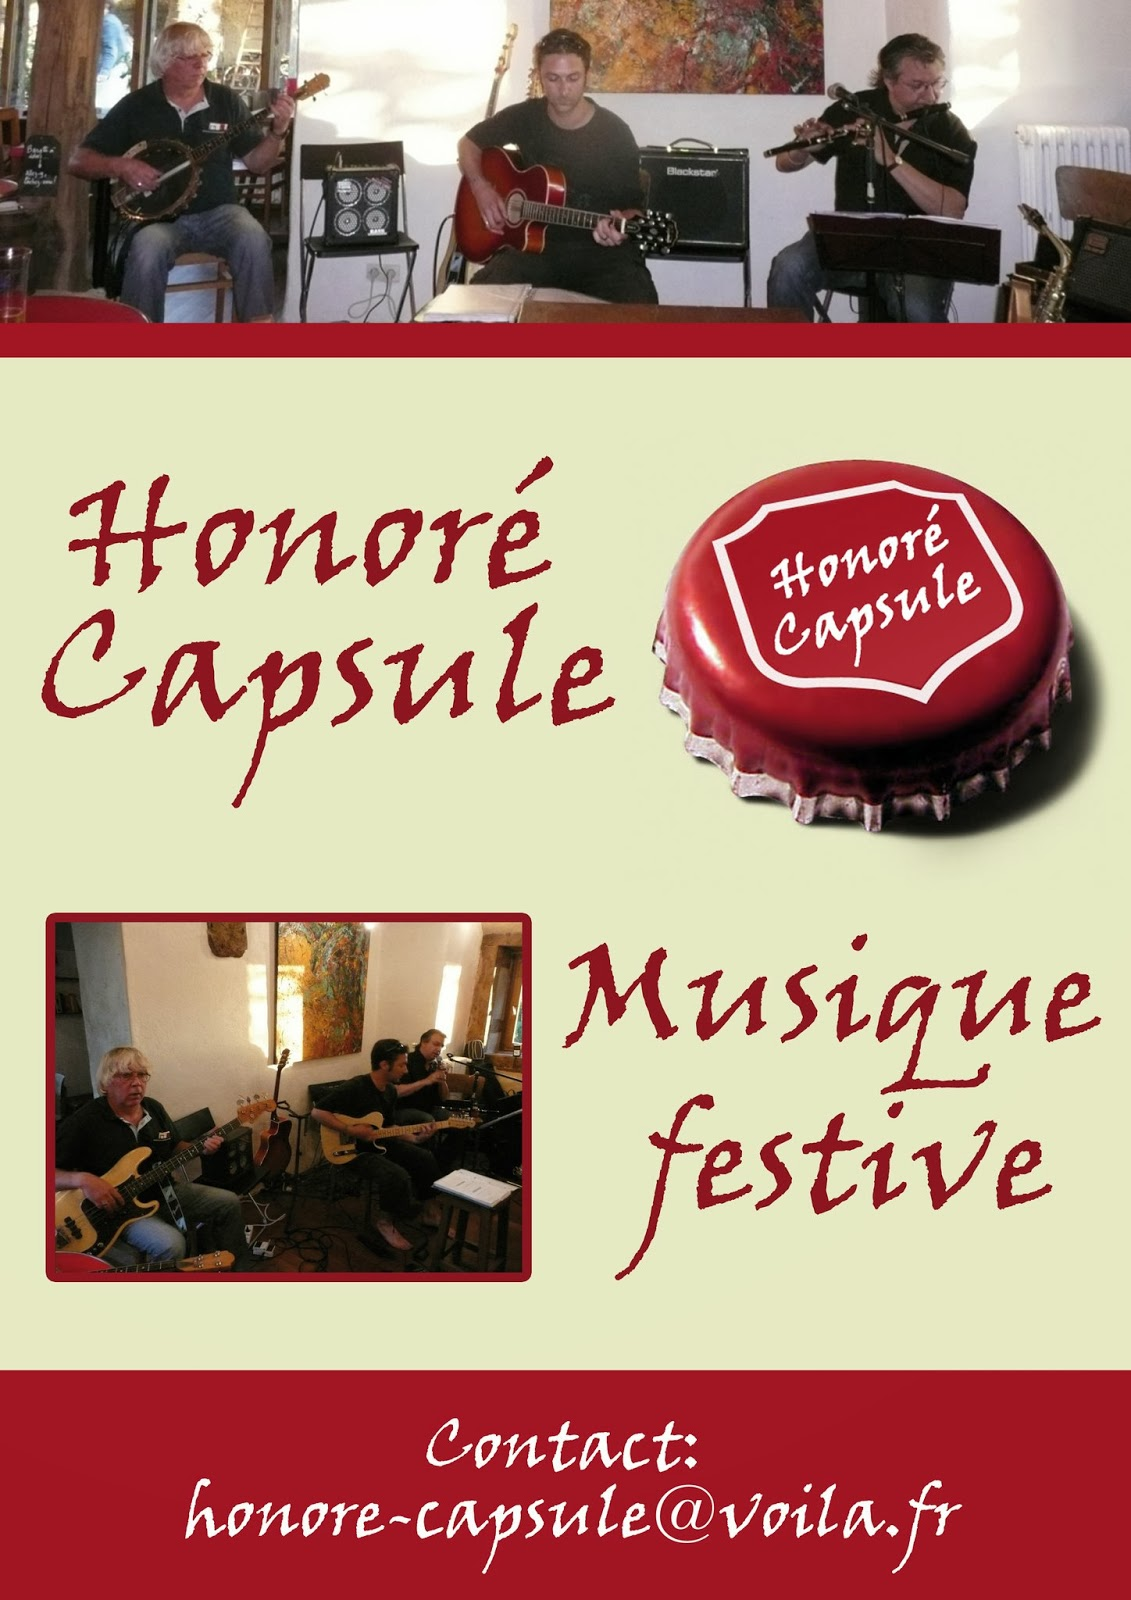 Honoré Capsule